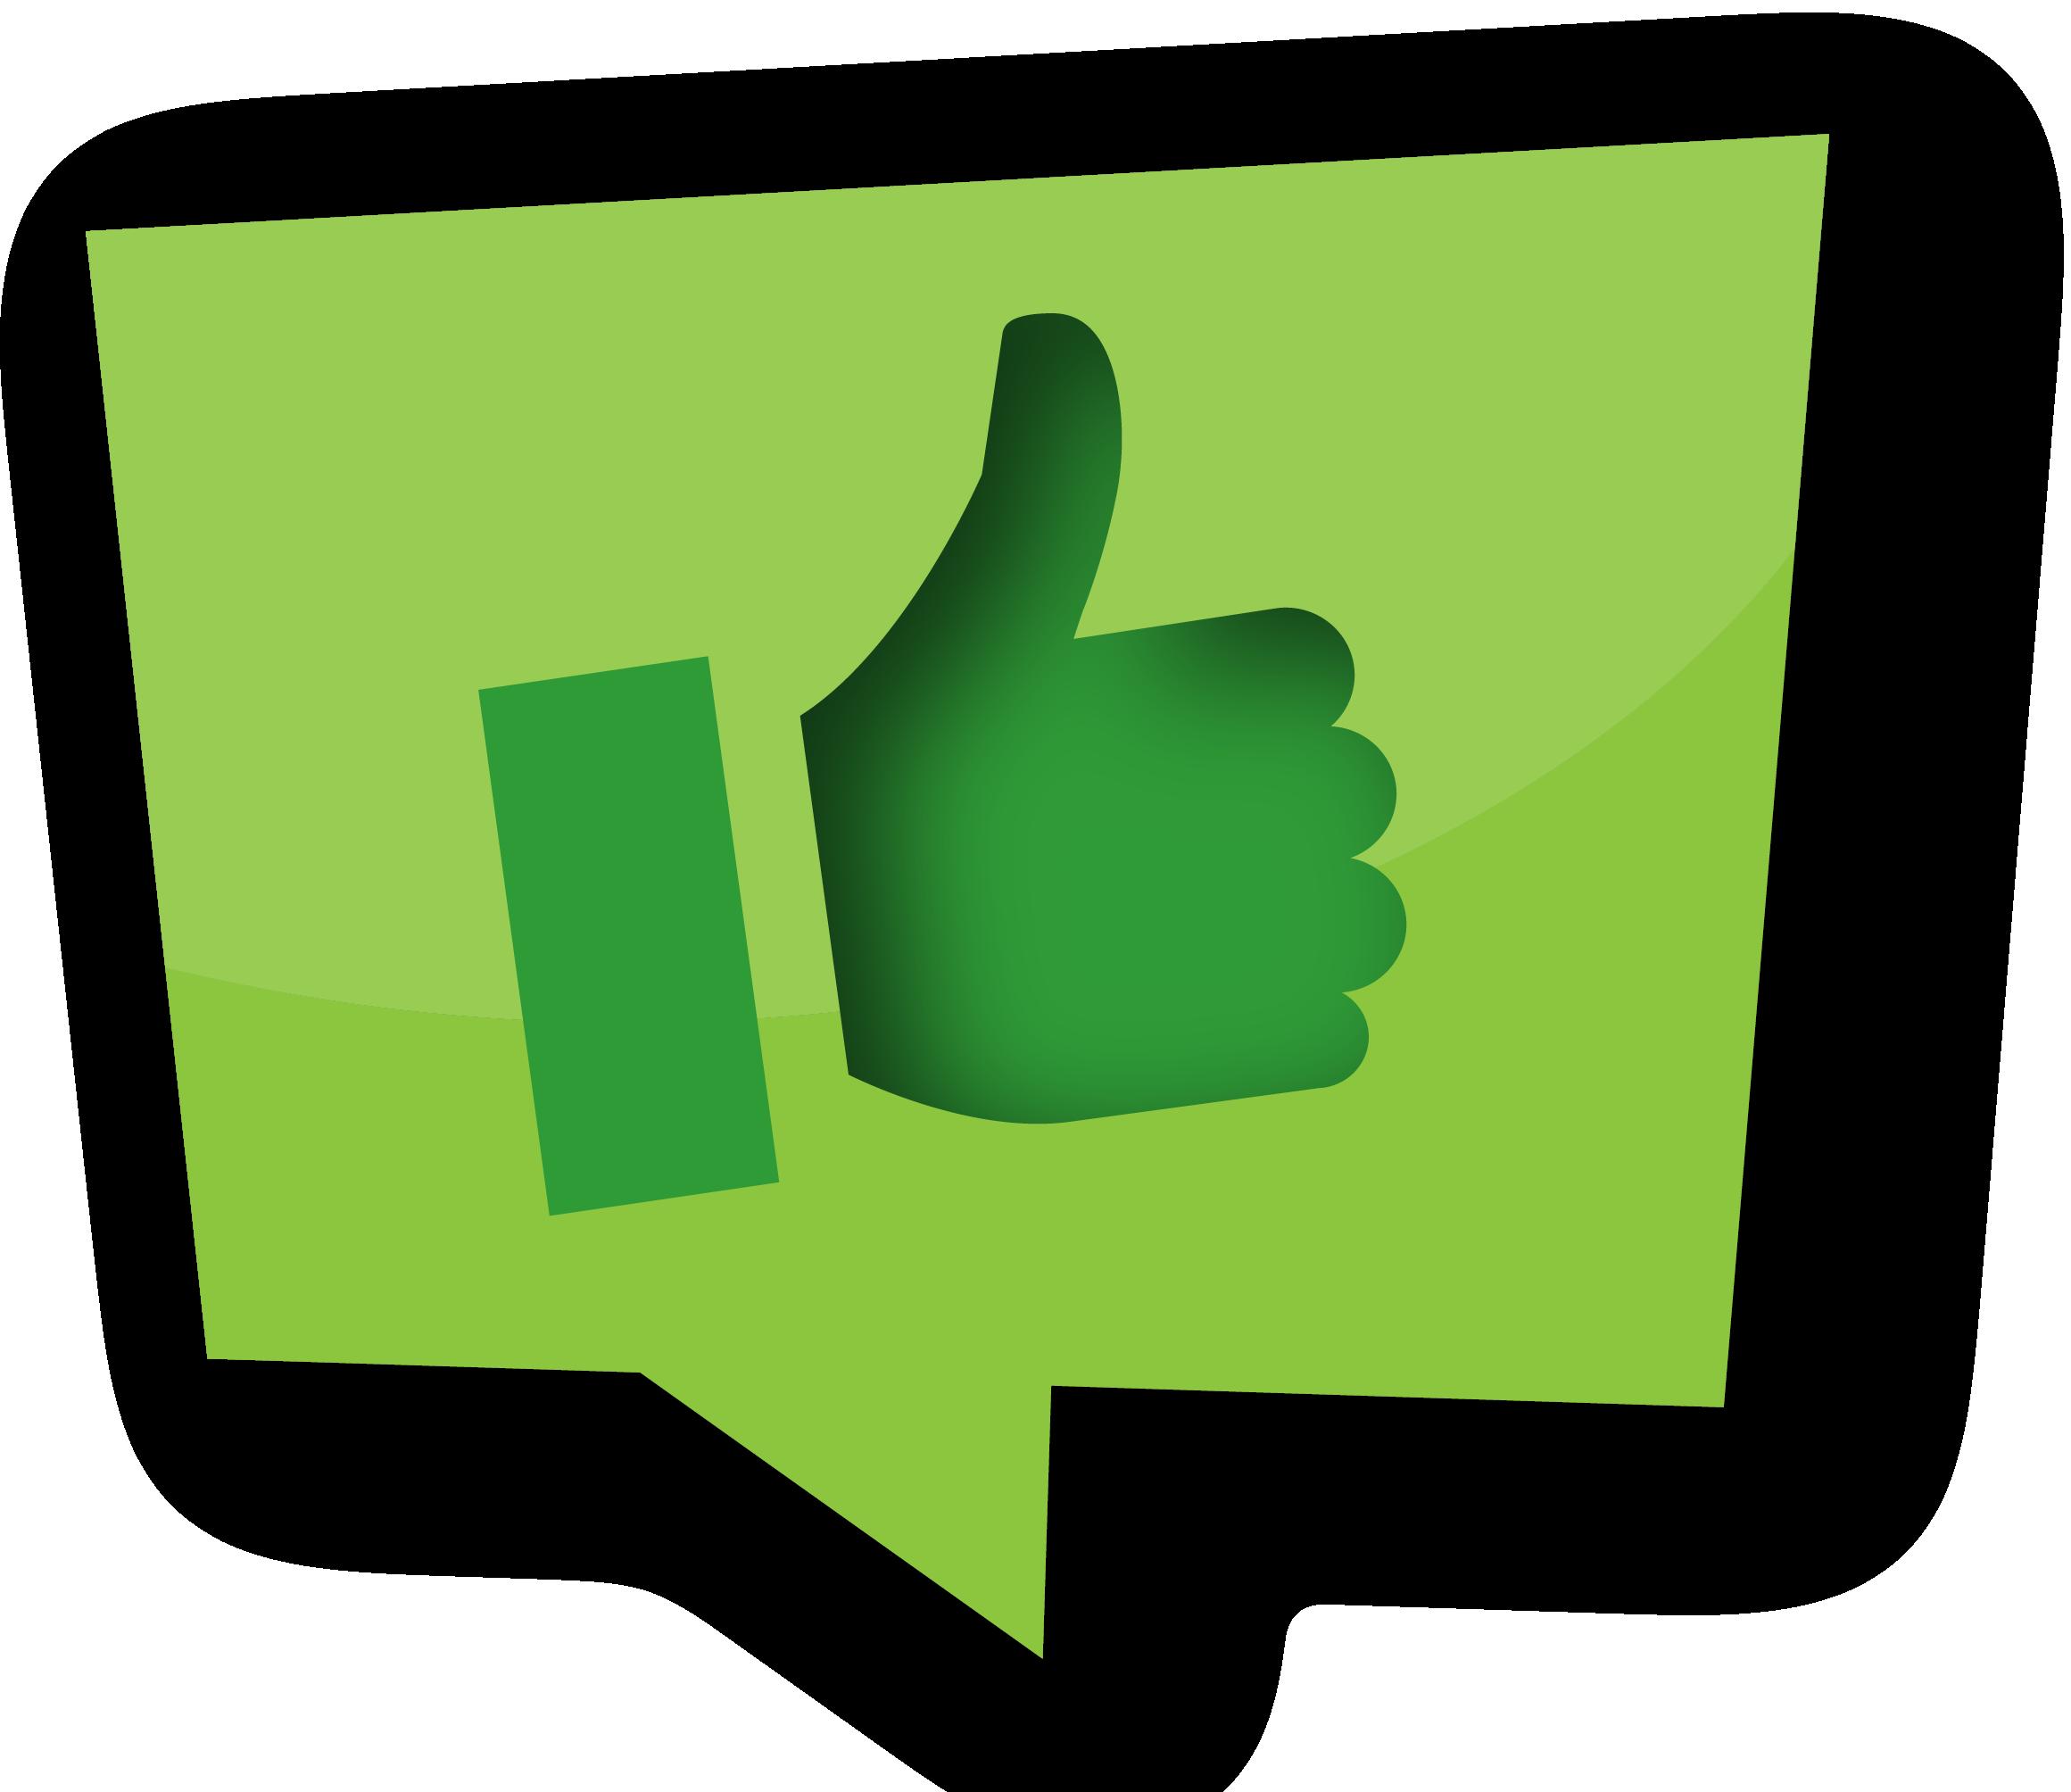 Customer Satisfaction Survey Gaming Logos Symbols Surveys